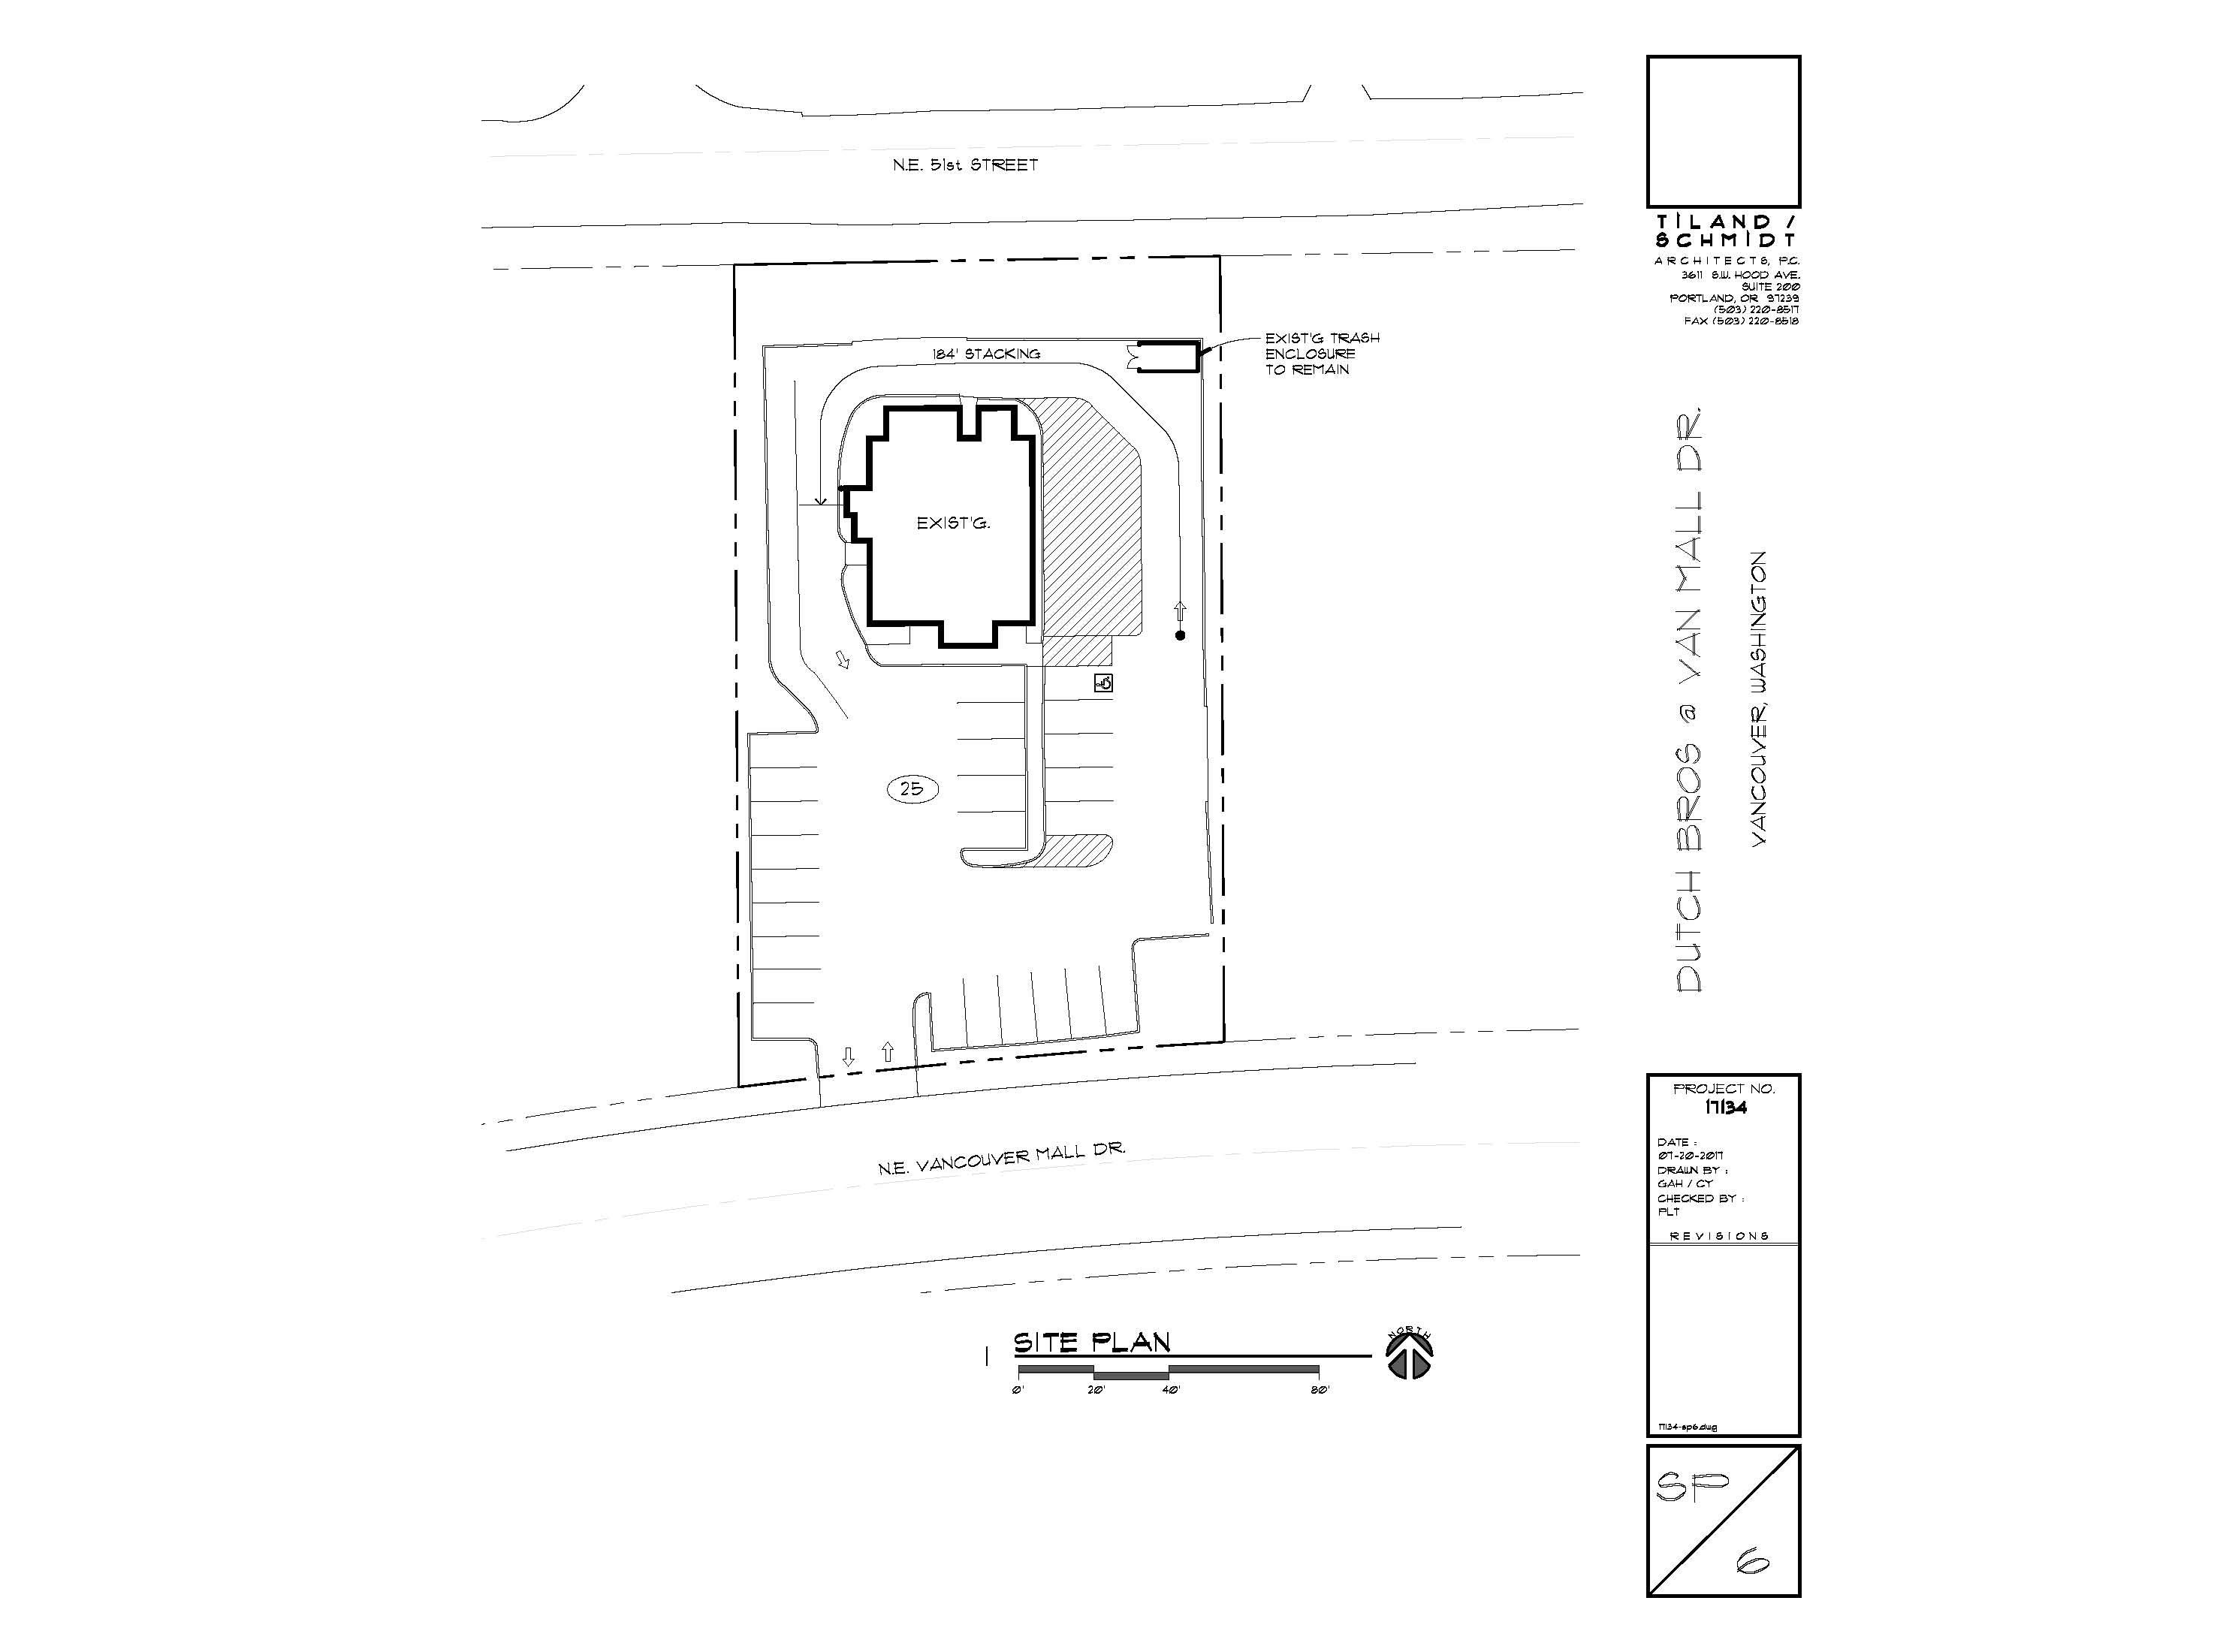 Dutch Bros Site Plan - Van Mall Drive